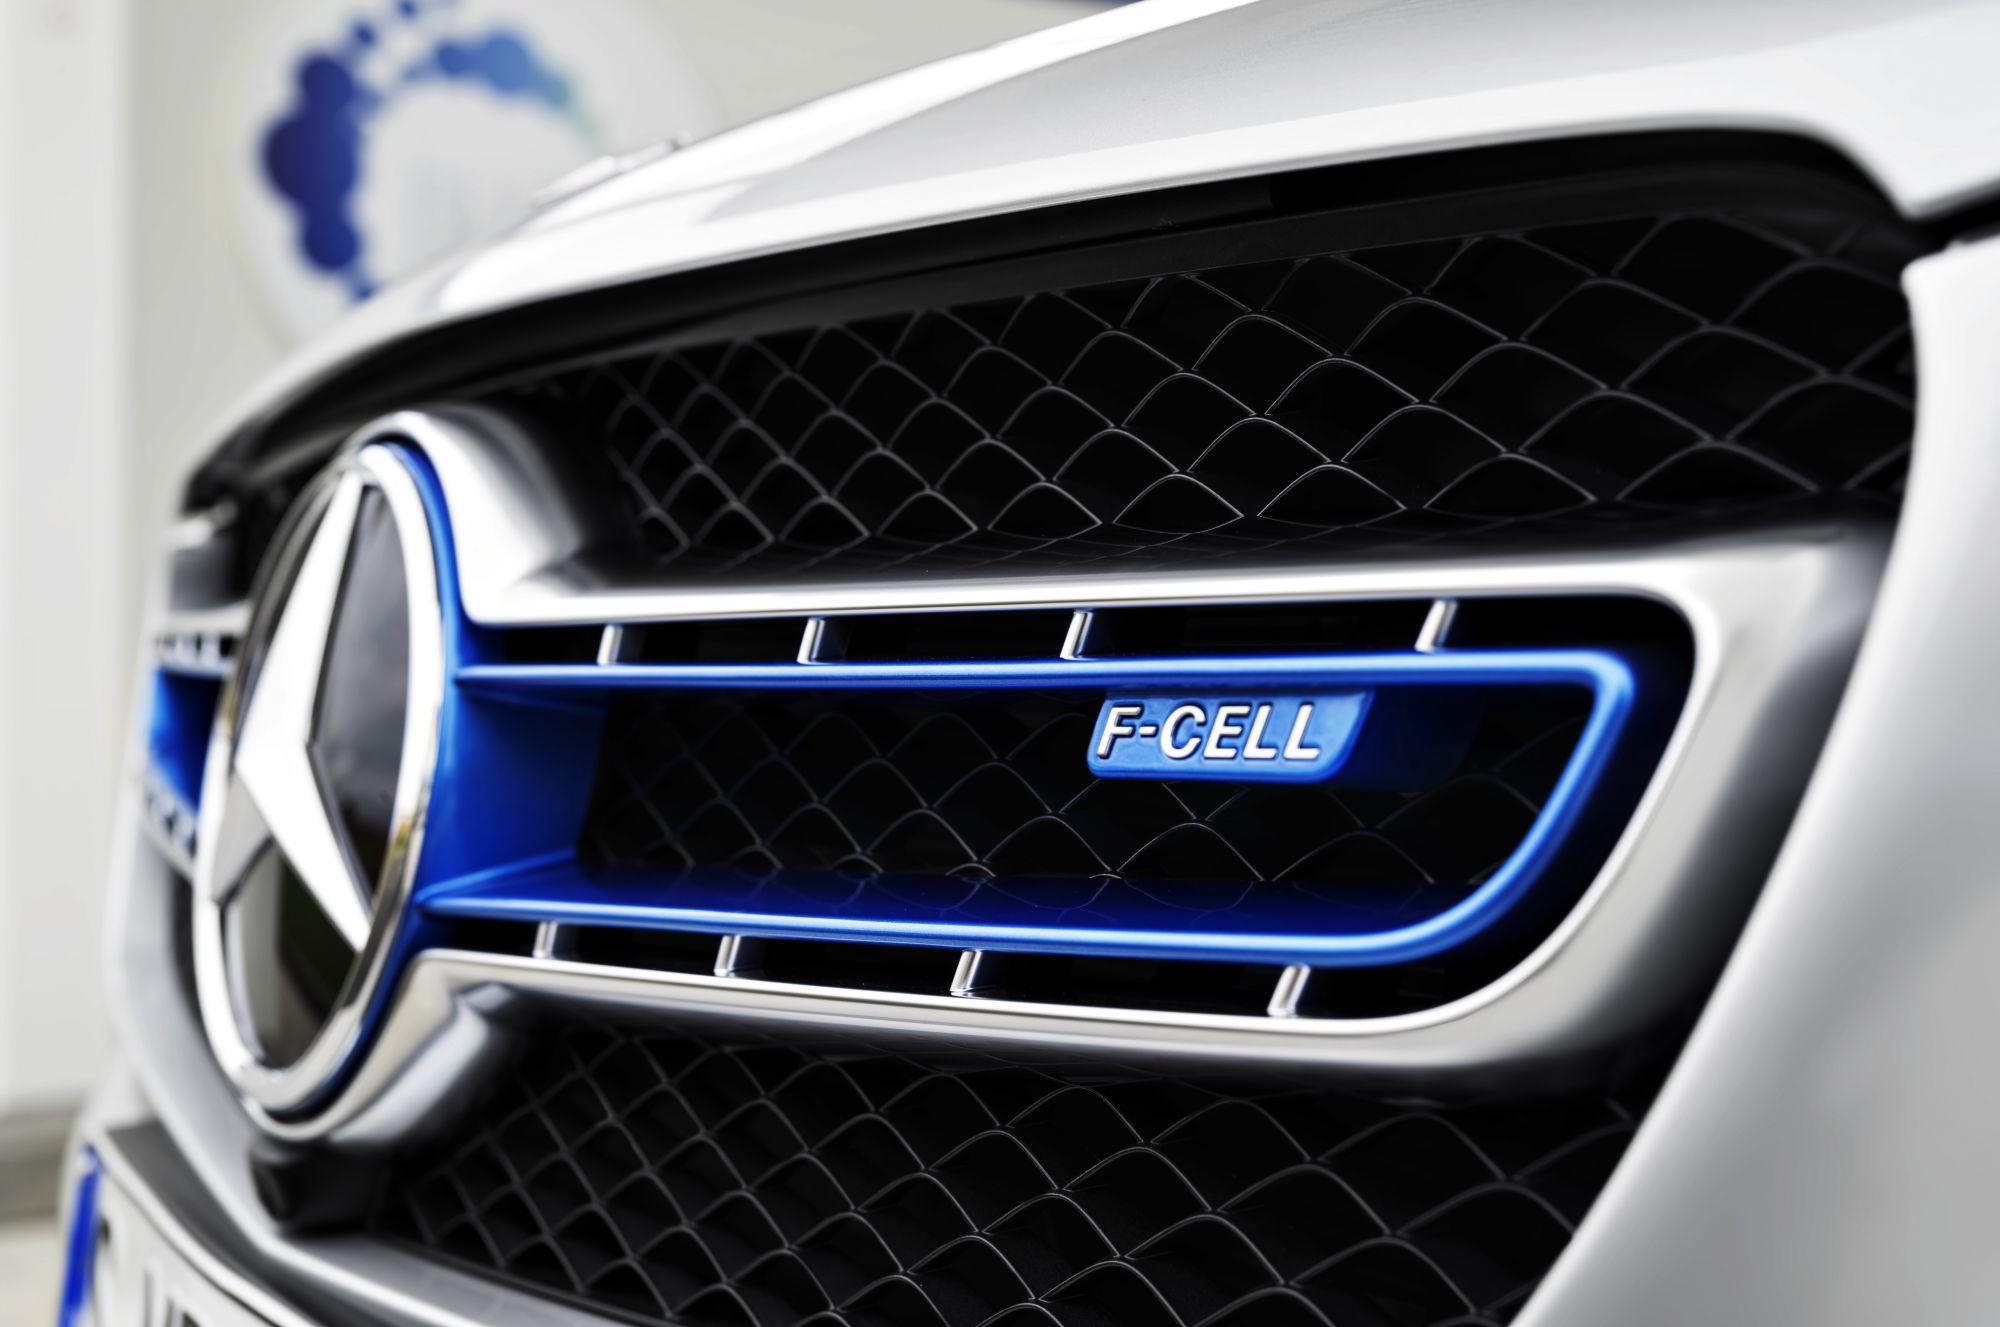 Mercedes glc f cell kombiniert brennstoffzelle und batterie for Mercedes benz delaware